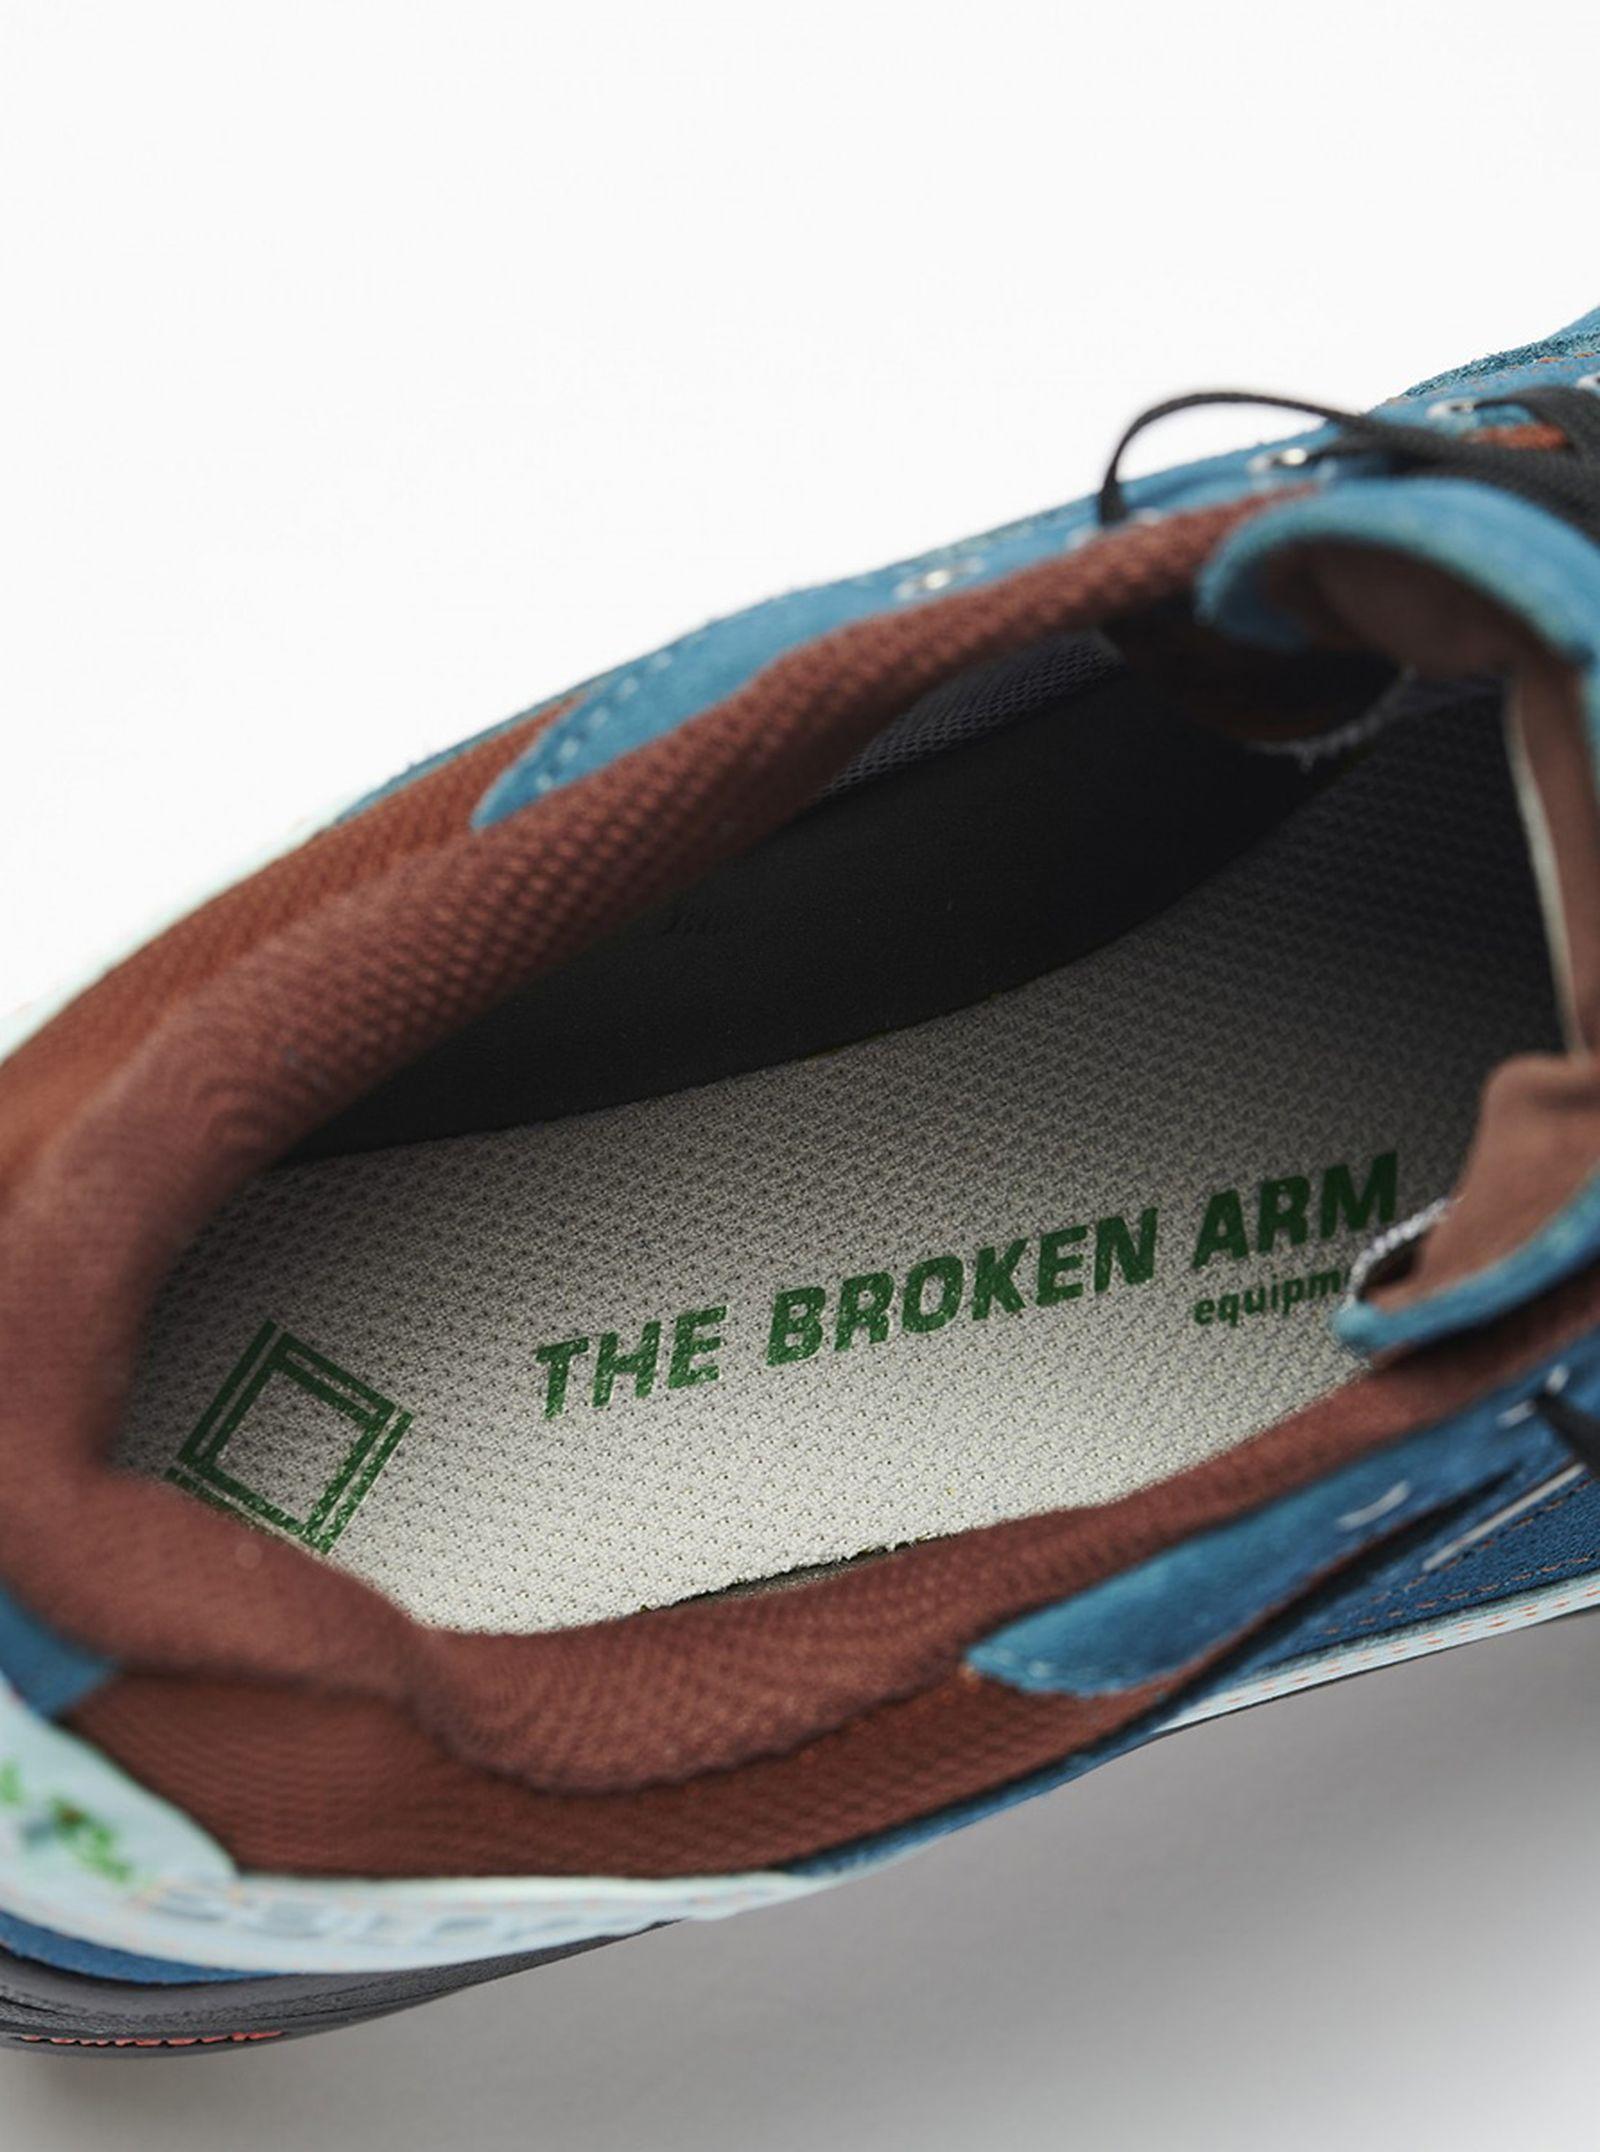 the-broken-arm-salomon-x-desalpes-release-info-04